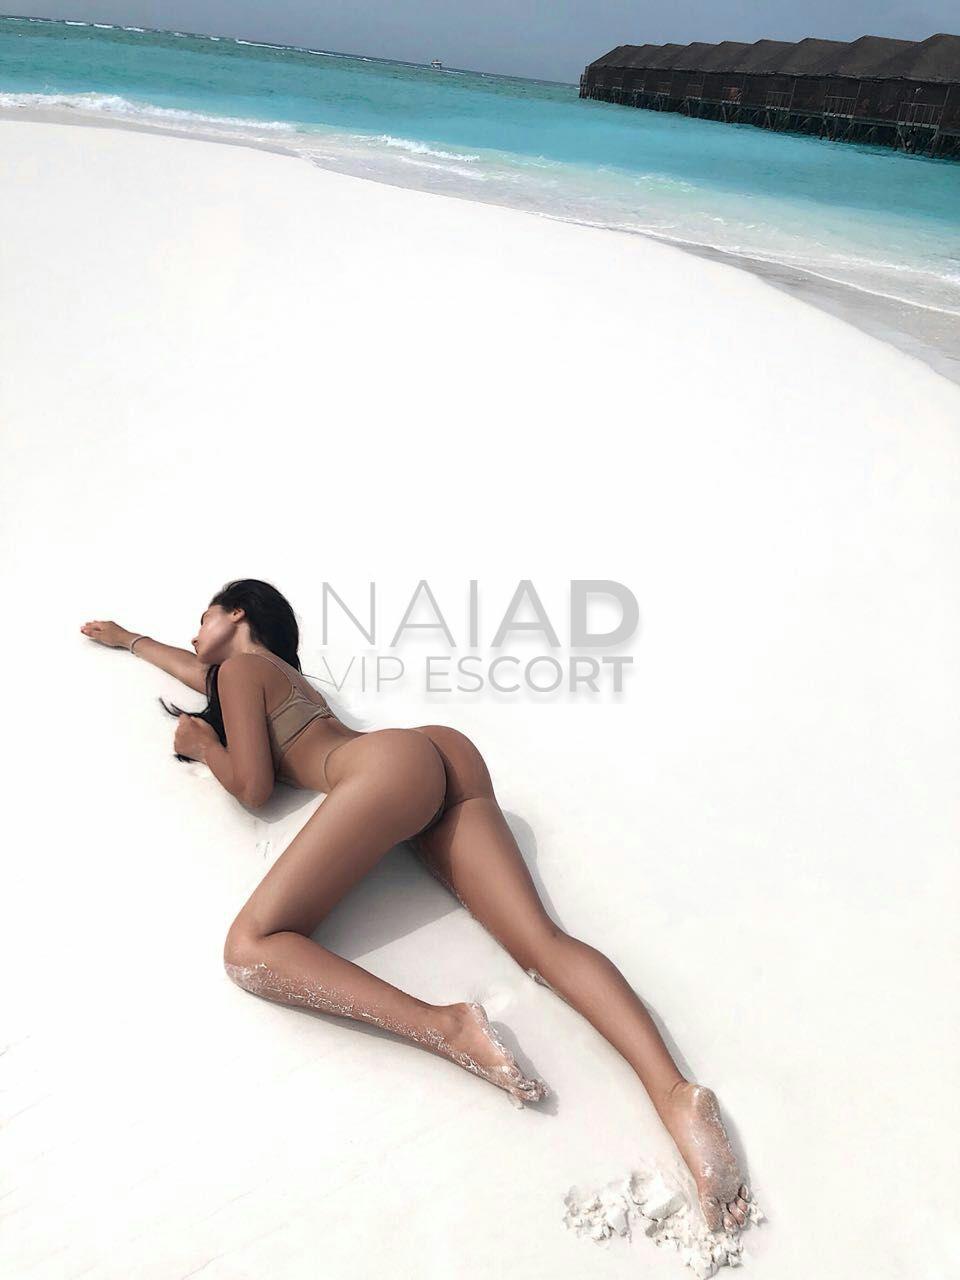 Photo of Lopes on Naiad vip escort service in Paris